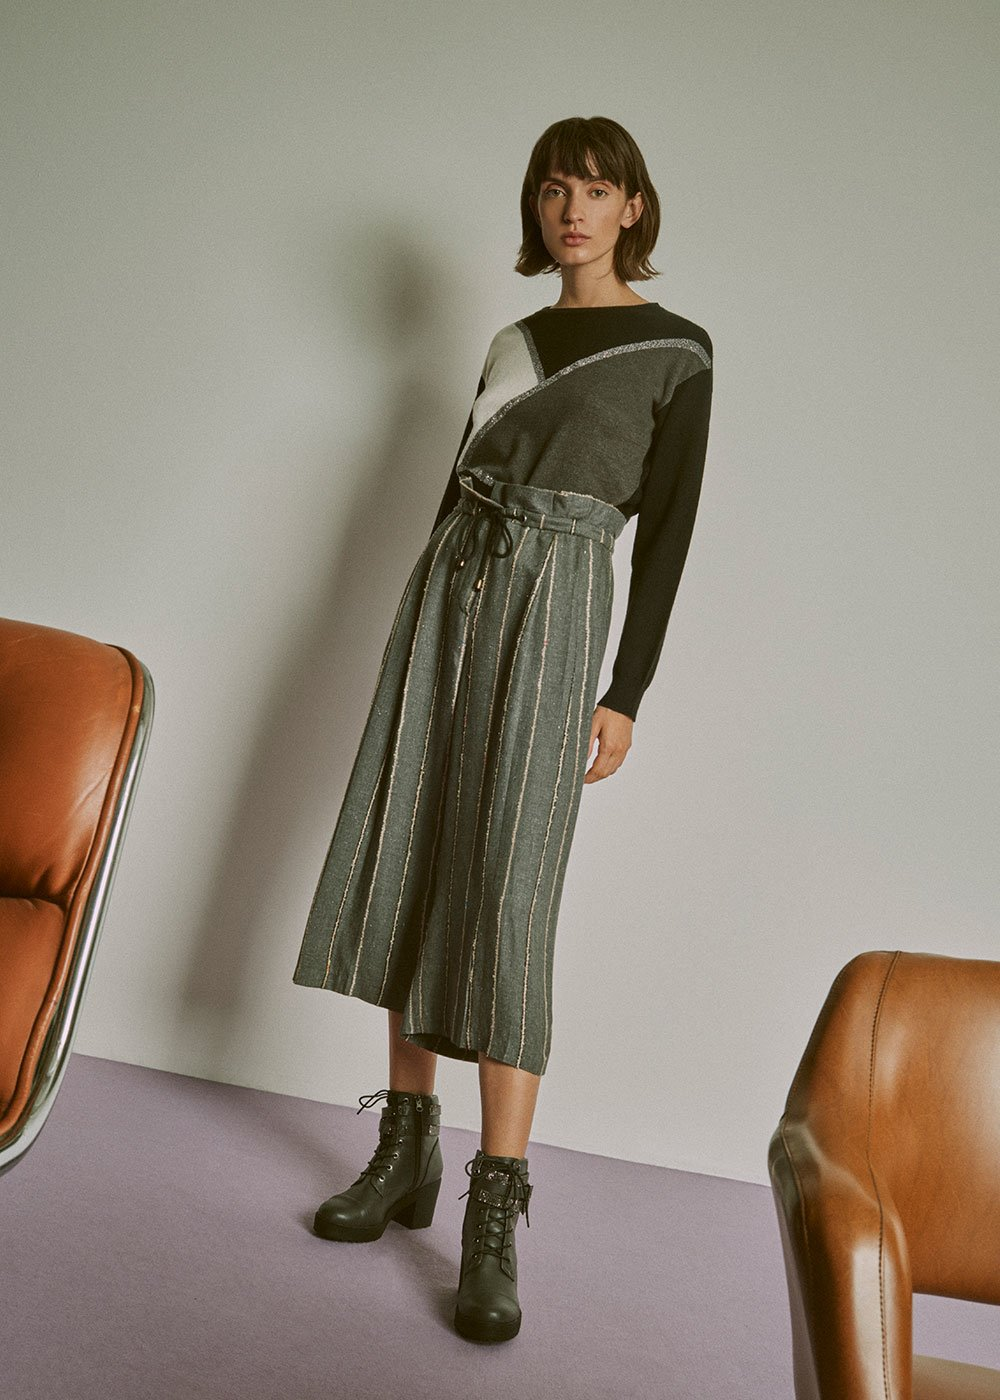 Pantalone Primo gamba corta - Grey Melange\L. Beige Stripes - Donna